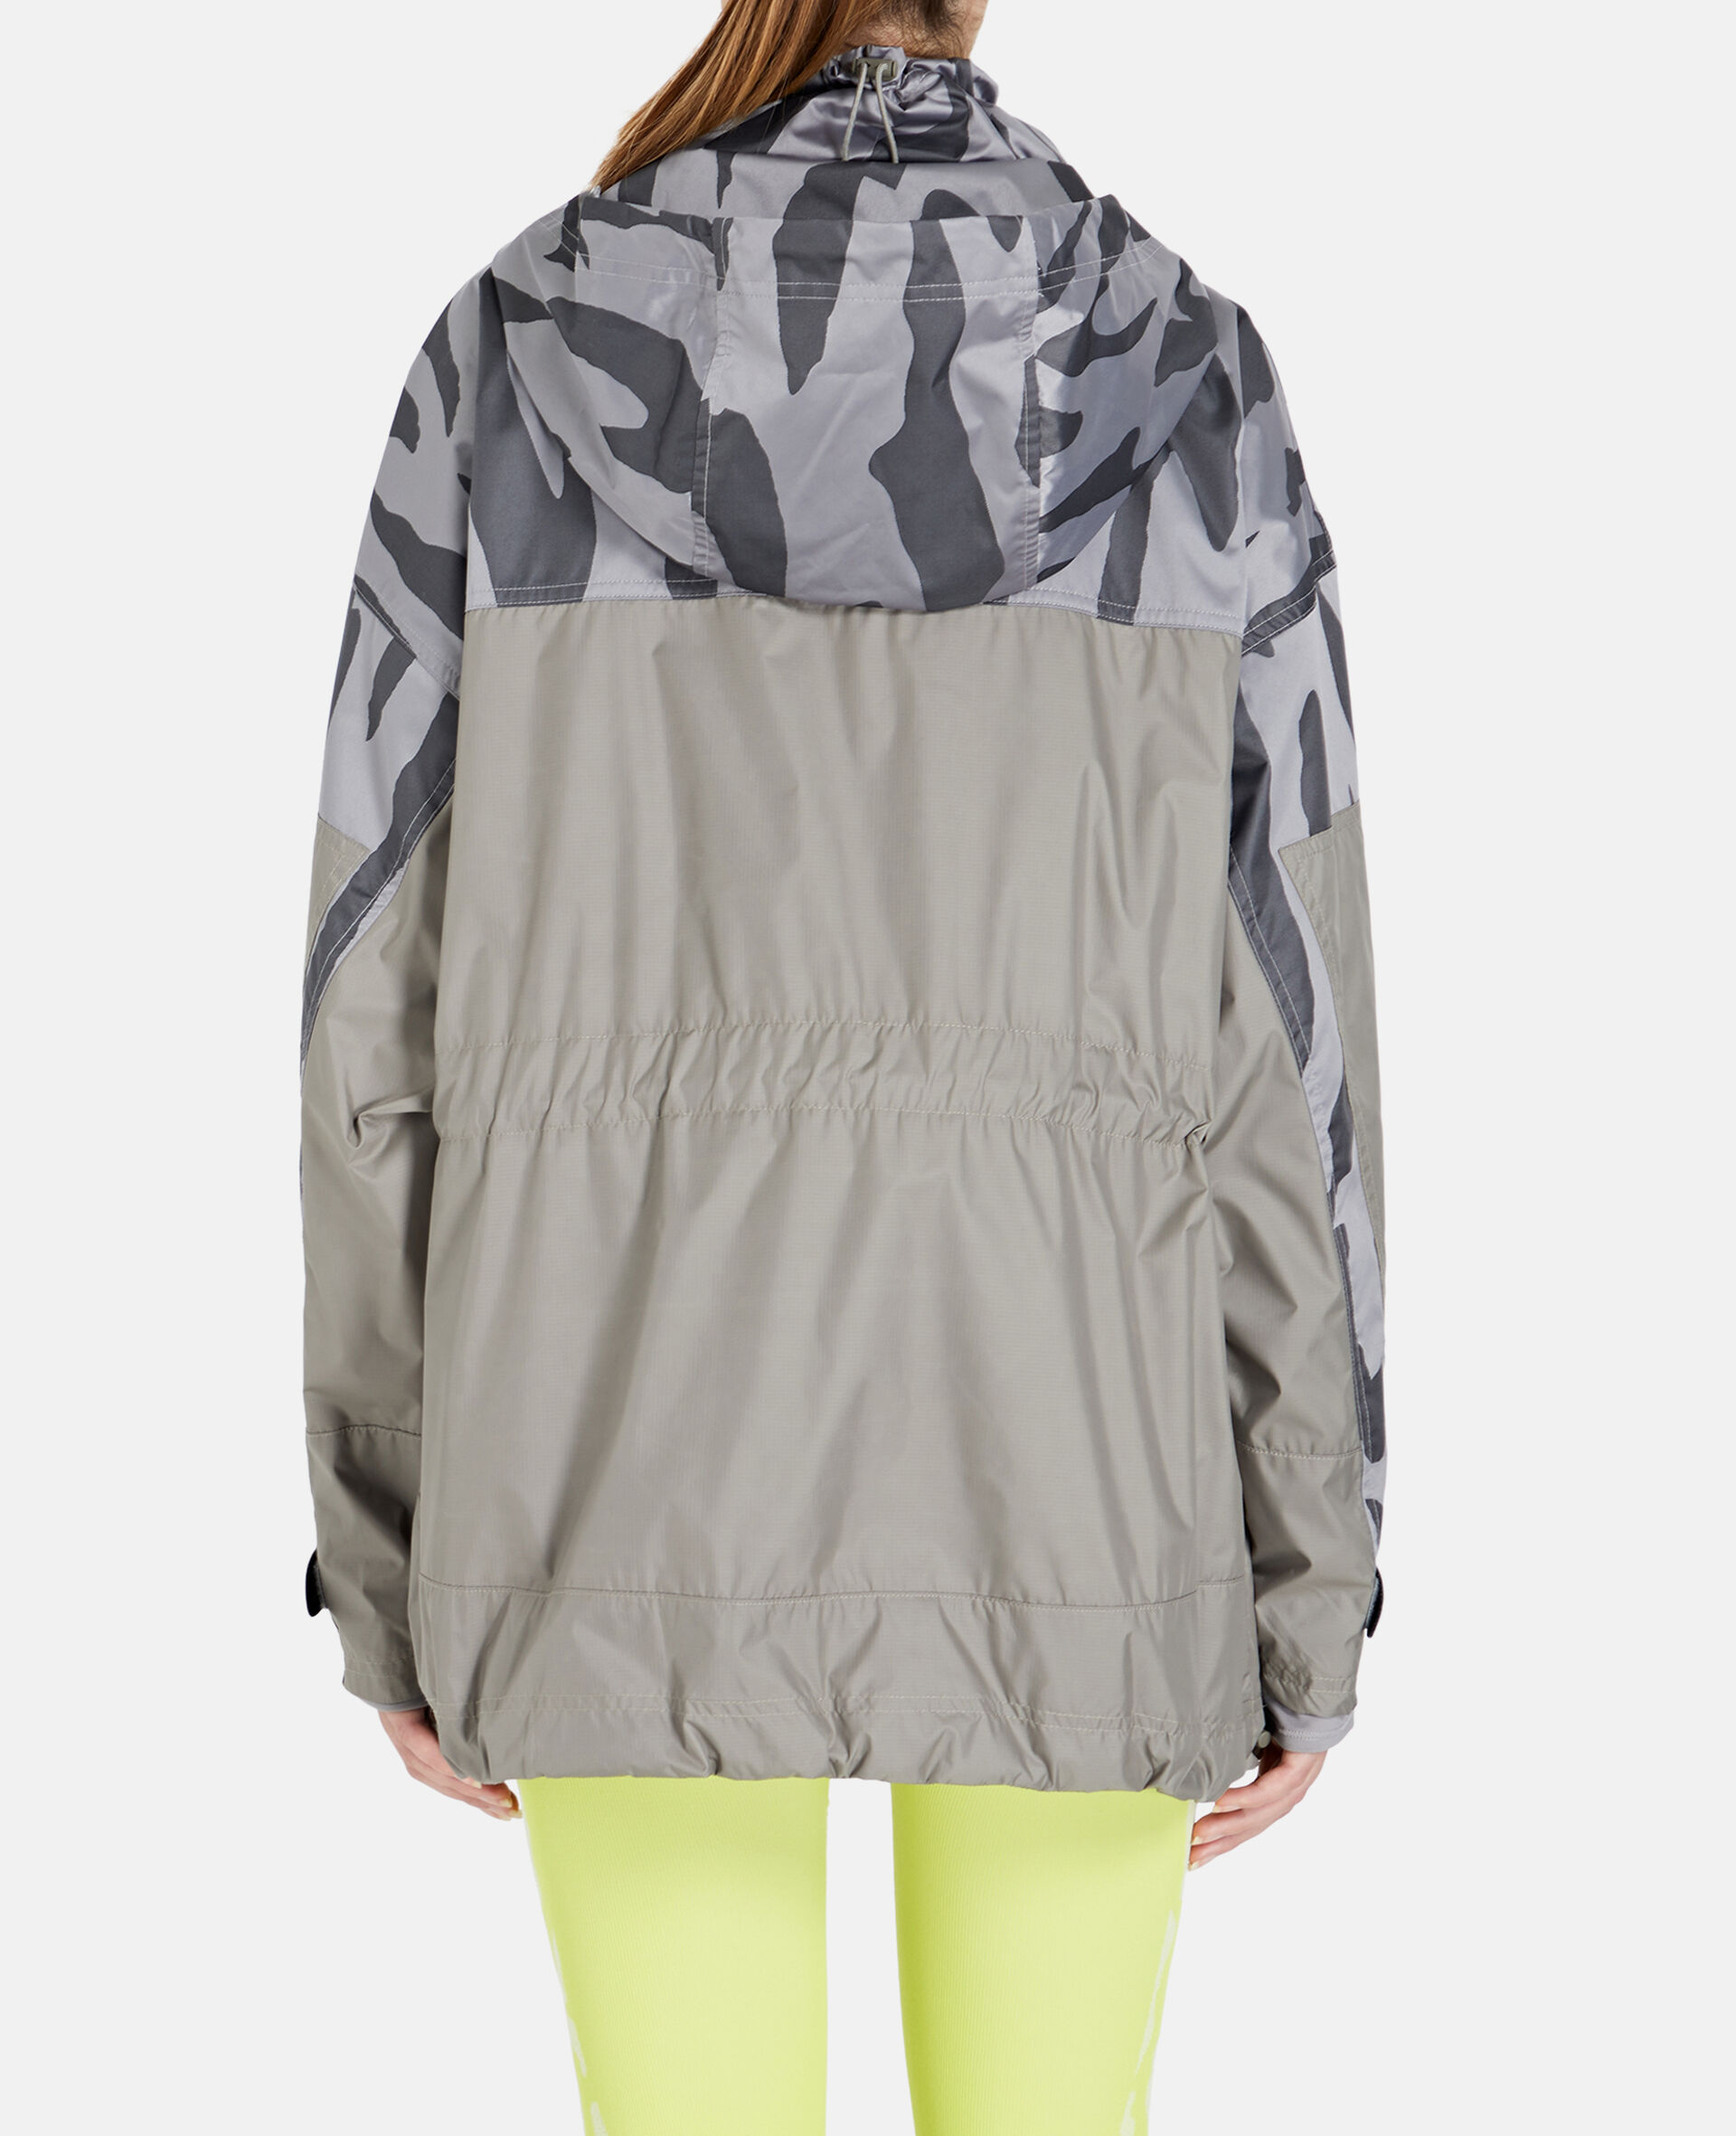 TruePace Running Jacket-Grey-large image number 2